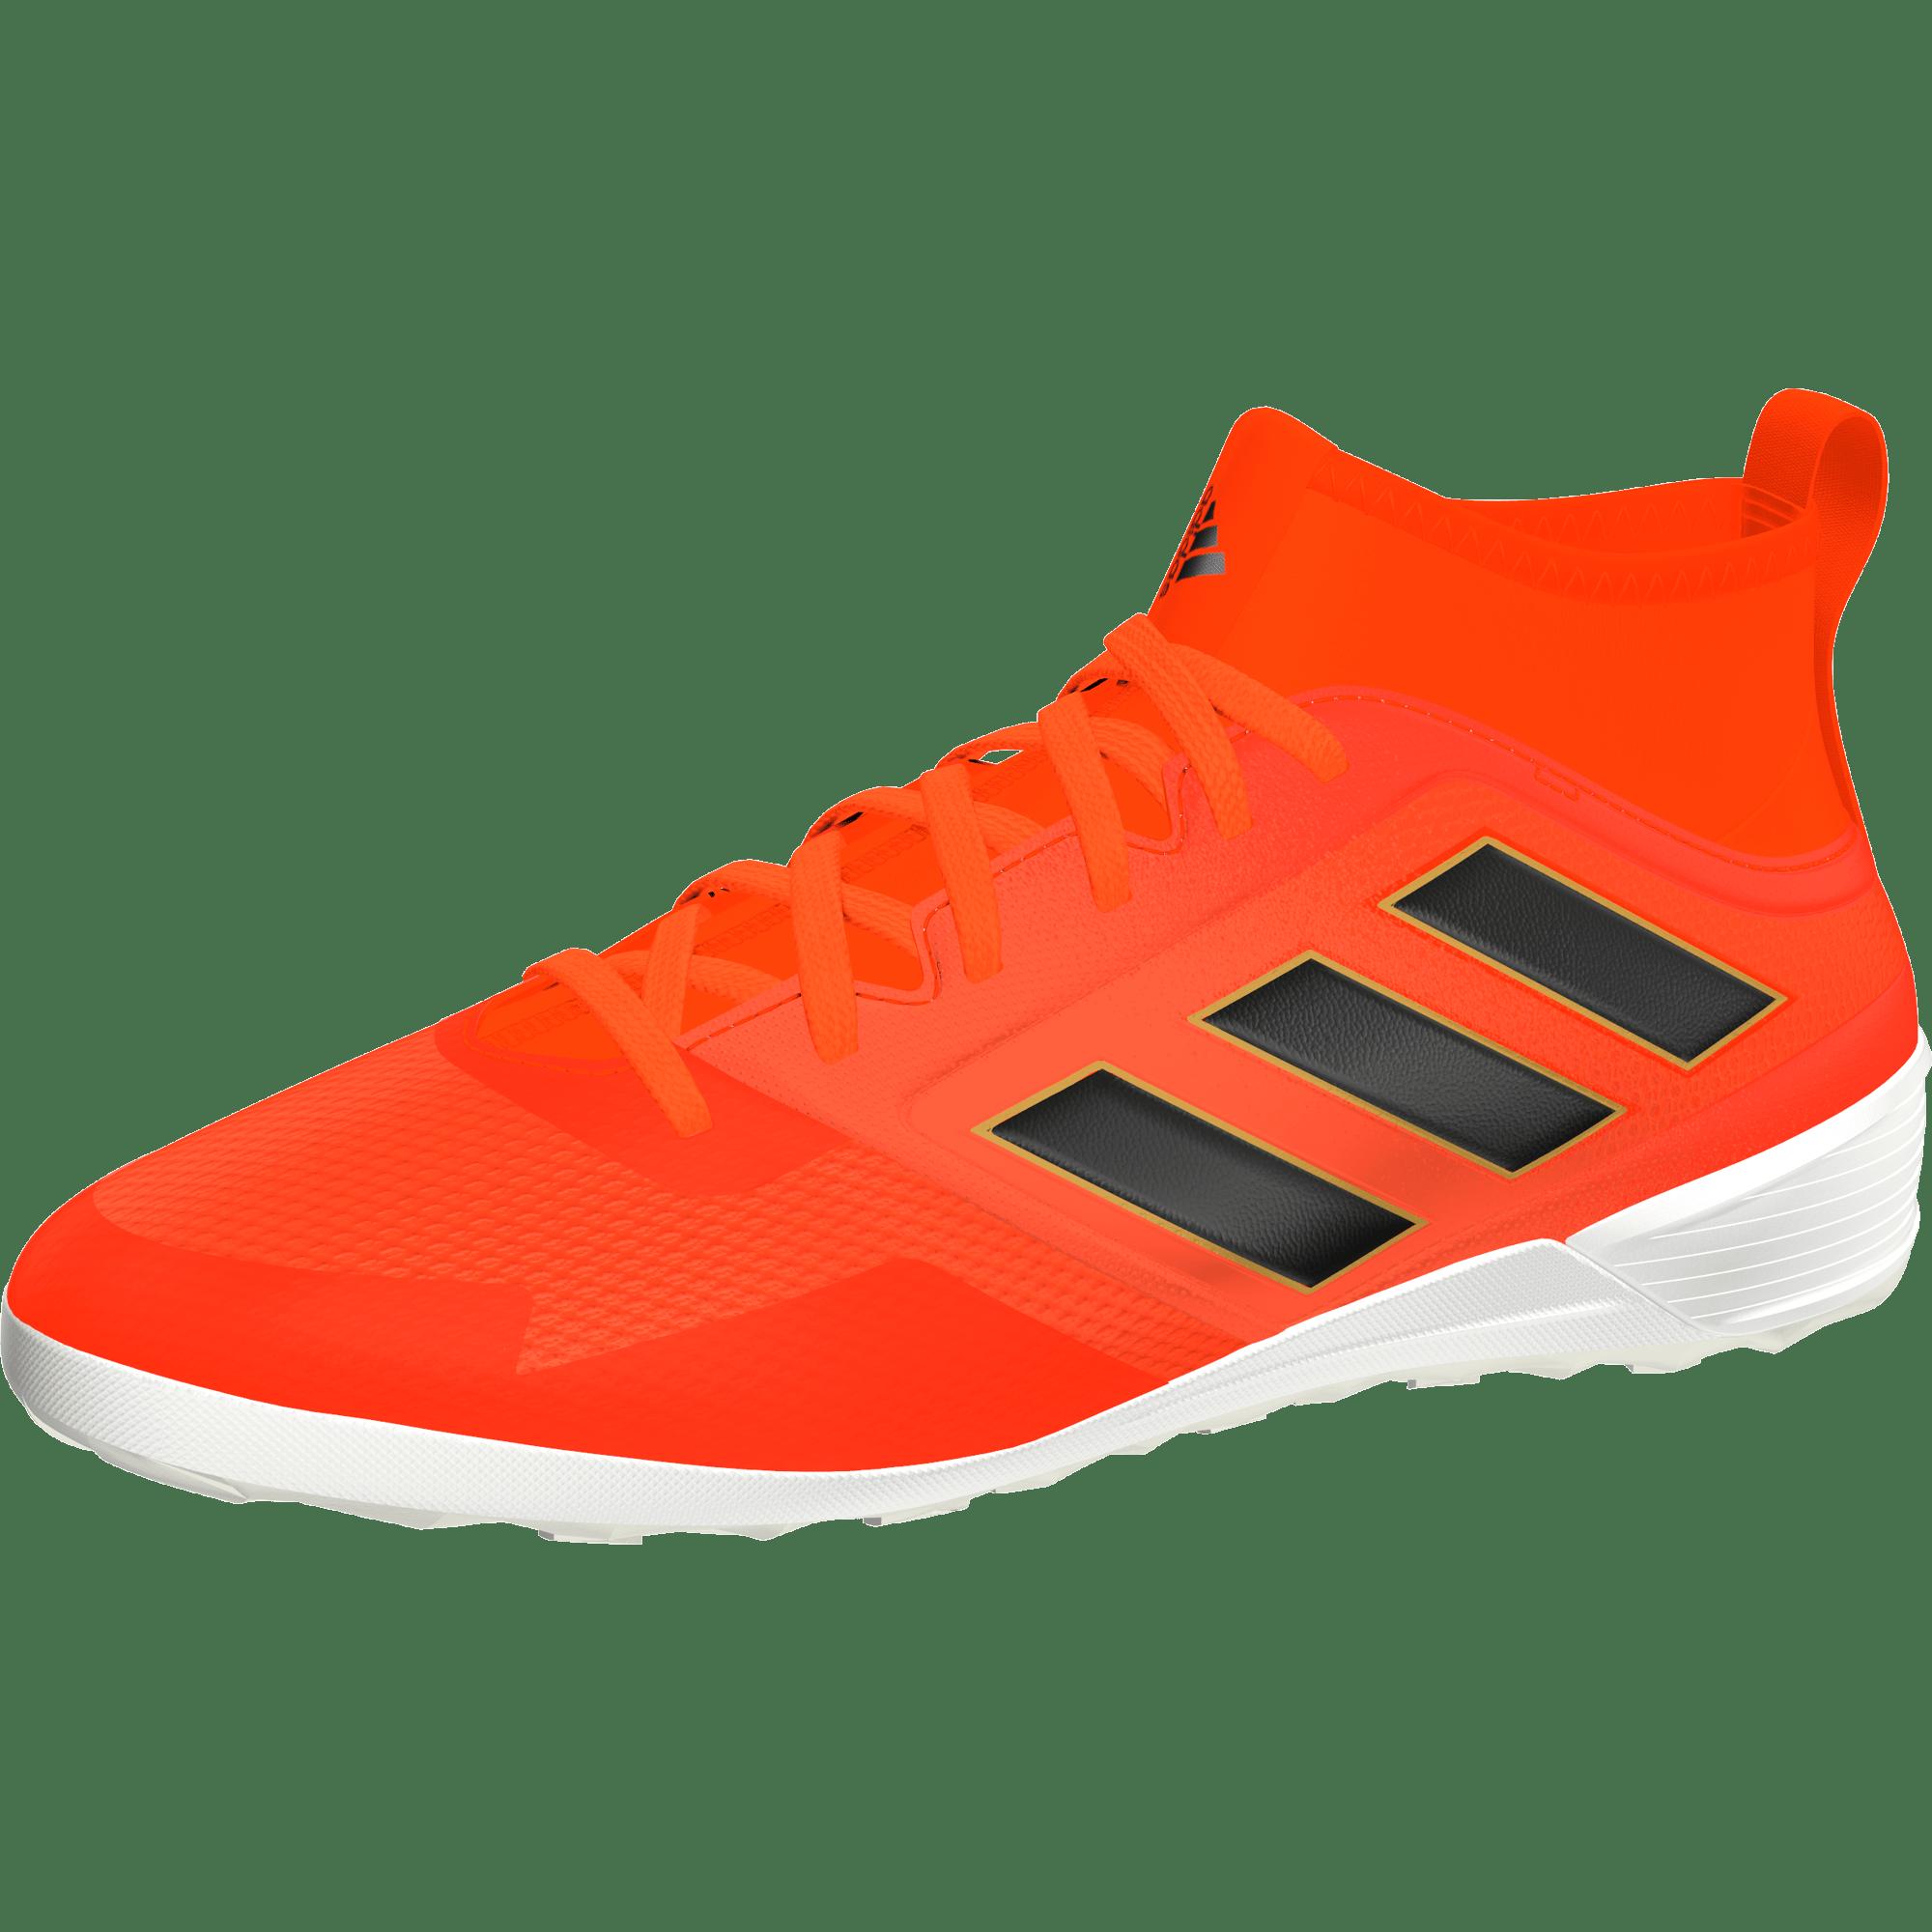 8fe3a9174 ... australia adidas ace tango 17.3 indoor boots solar red core black solar  orange 5aaa5 27662